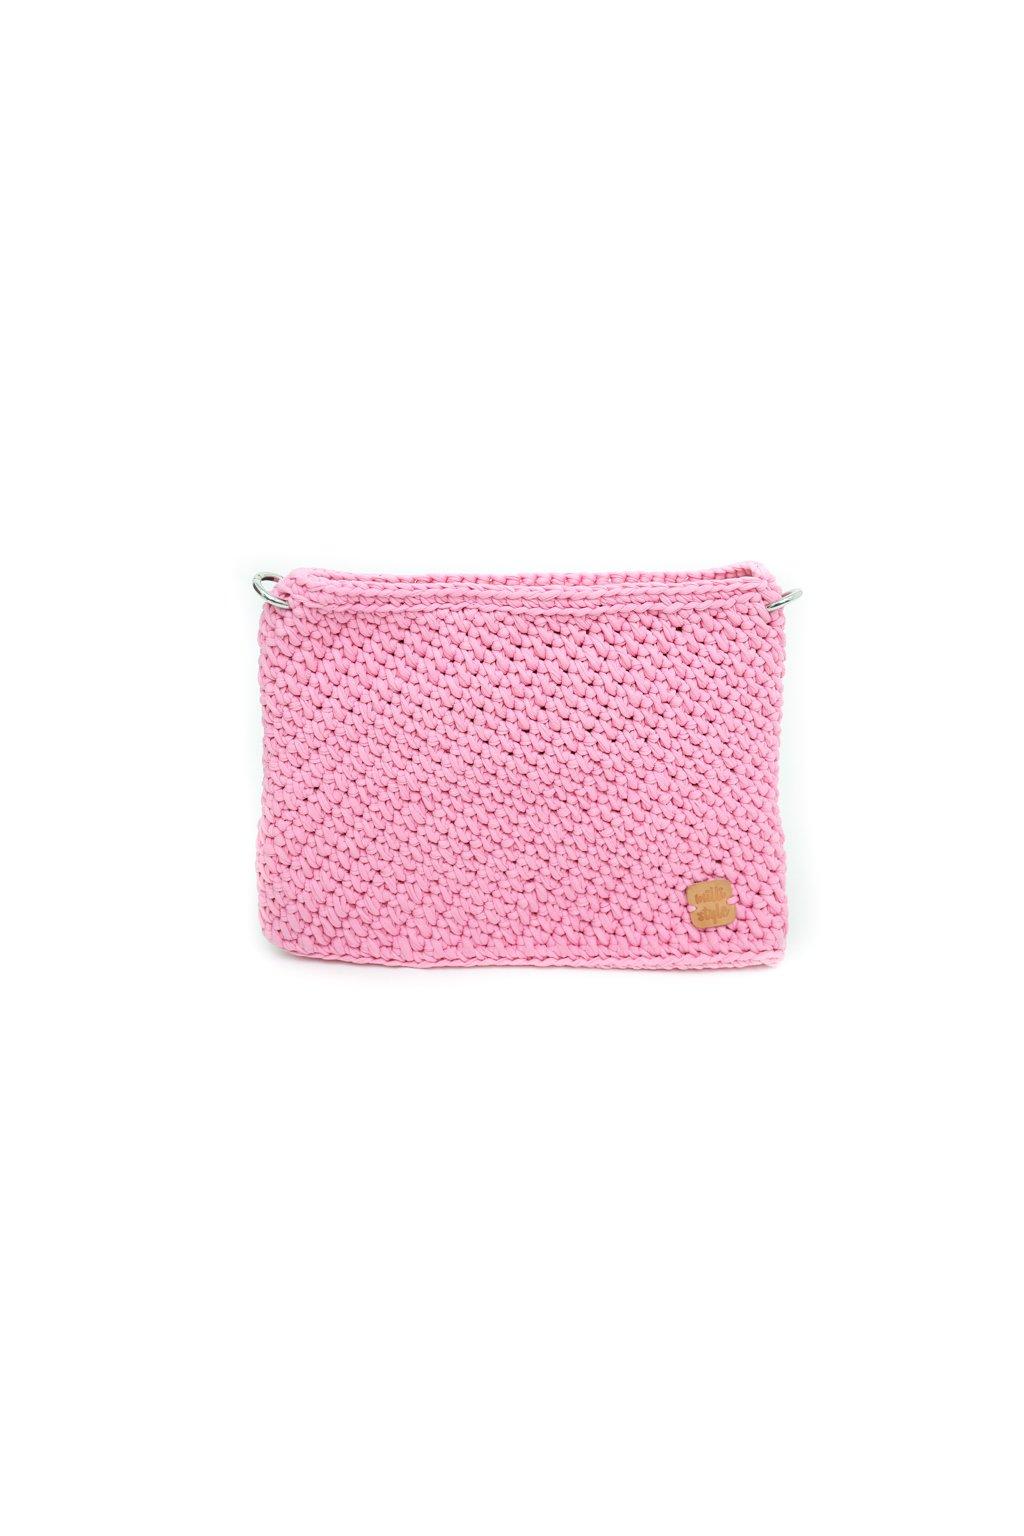 Kabelka na kočárek Milli Style, růžová